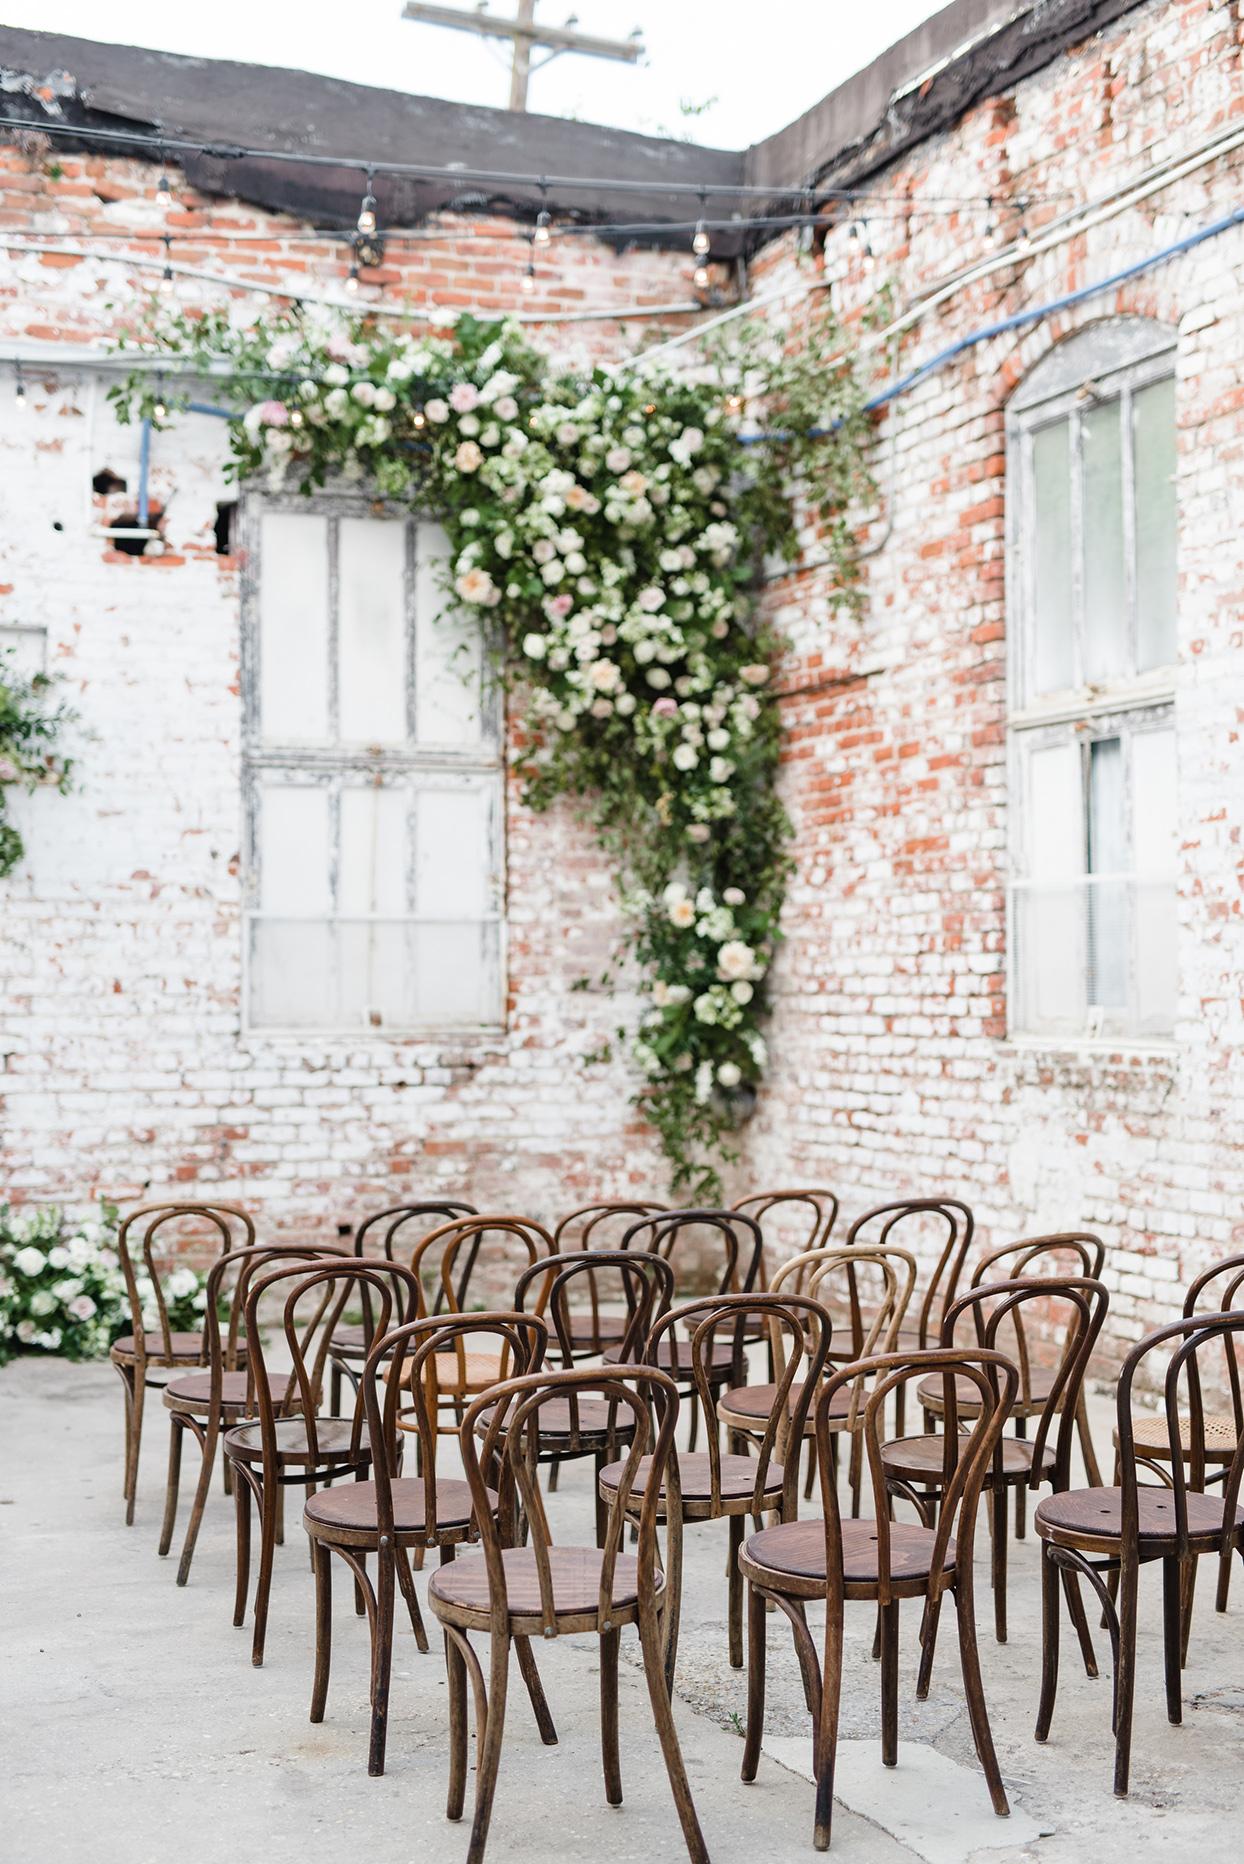 Wedding chair setup with flowers in brick corner